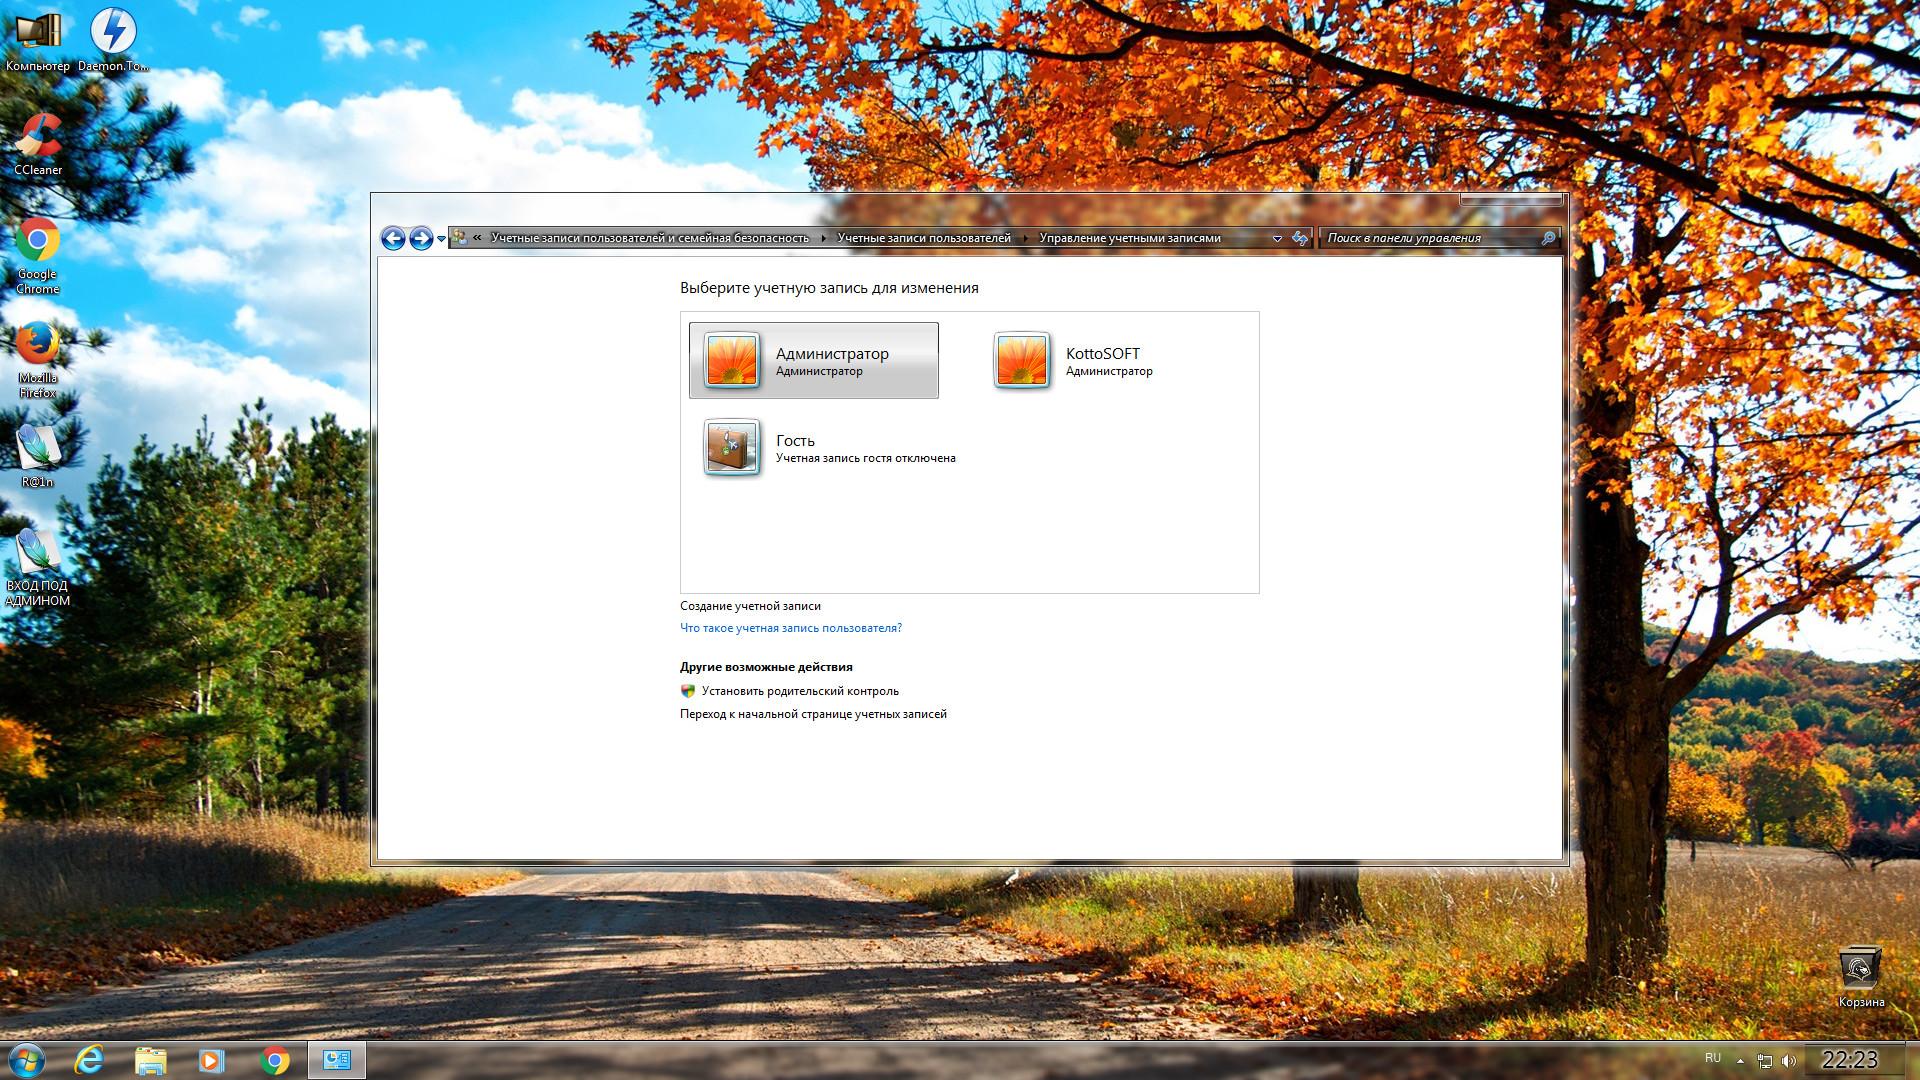 Windows 7 Professional SP1 KottoSOFT v.44 - «Windows»